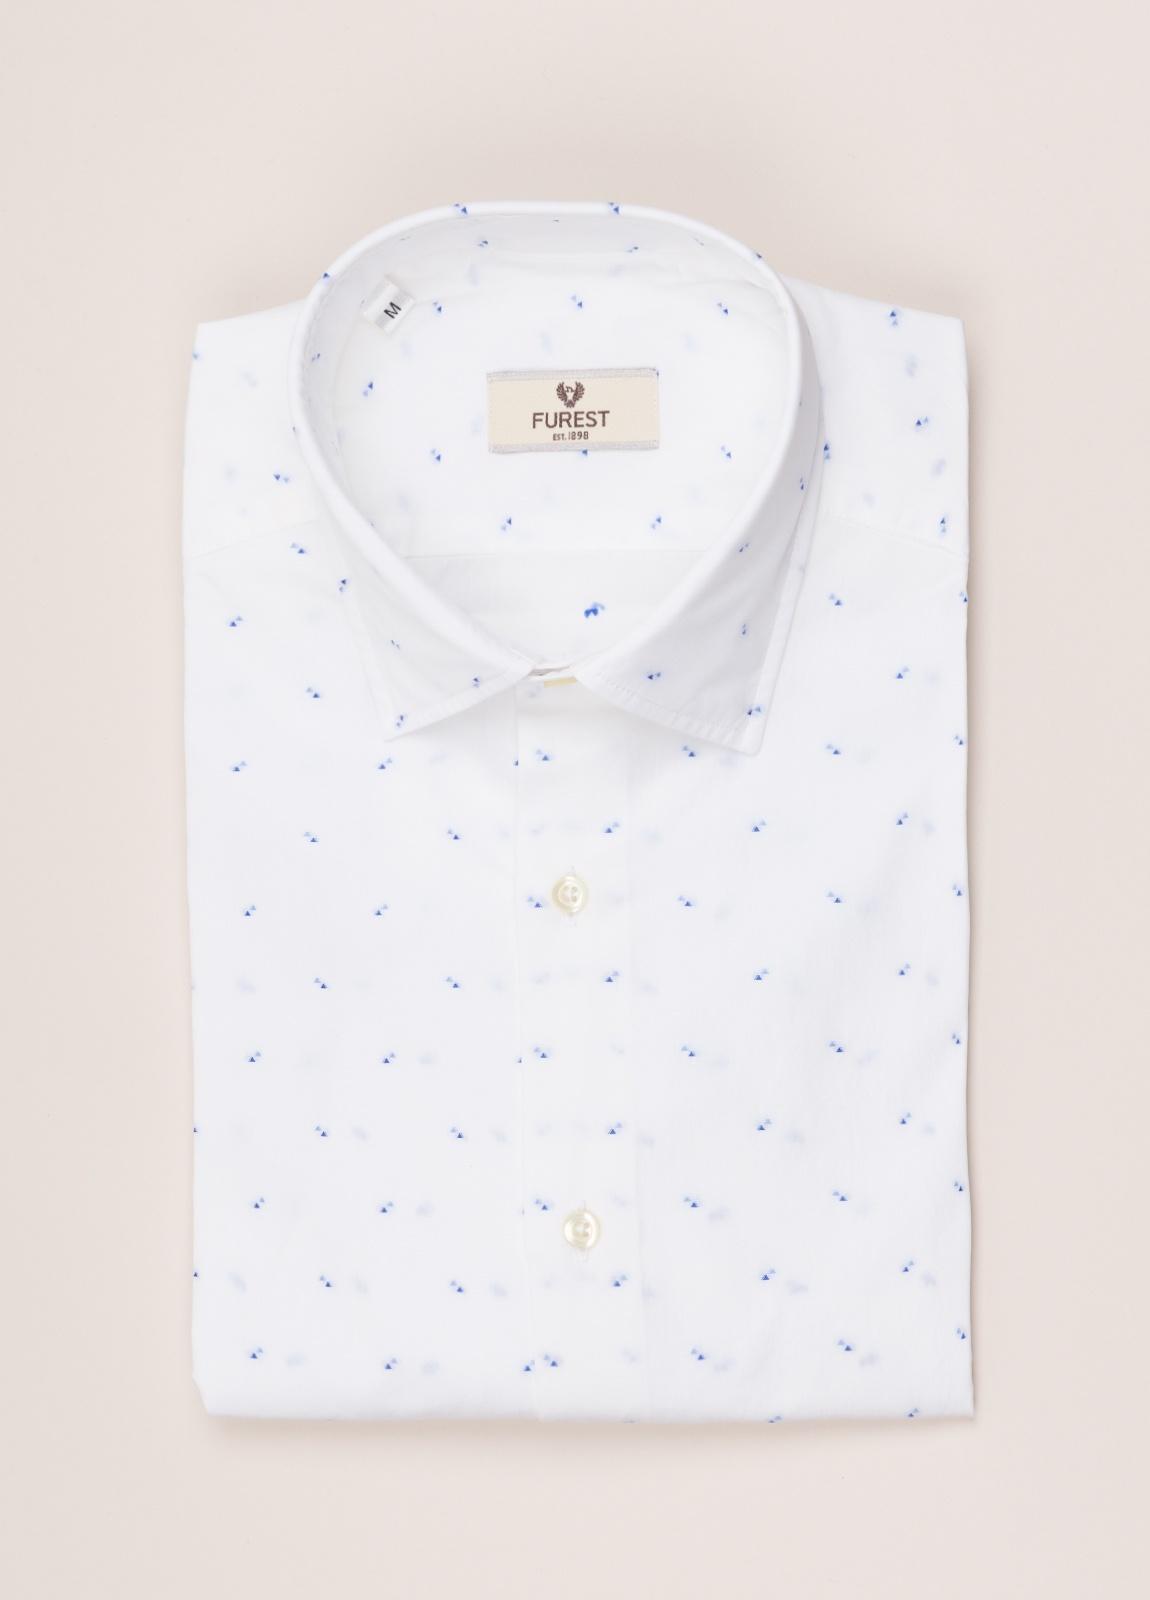 Camisa sport FUREST COLECCIÓN SLIM FIT dibujo geométrico